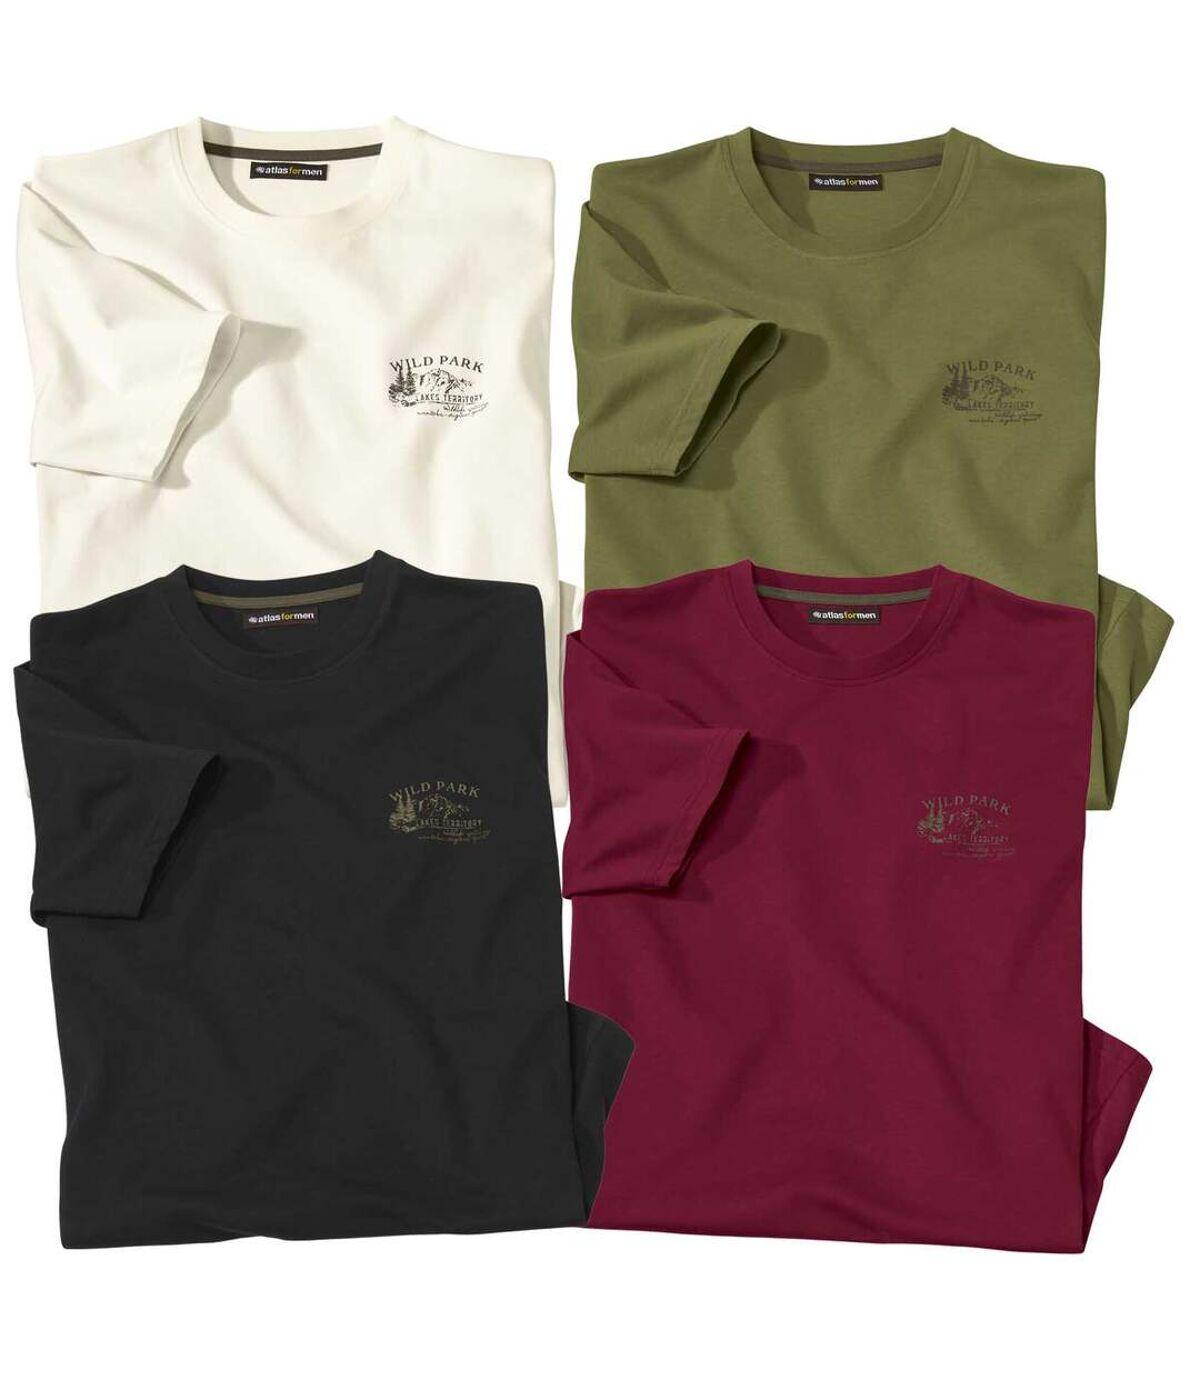 4er-Pack Casual-T-Shirts Atlas For Men